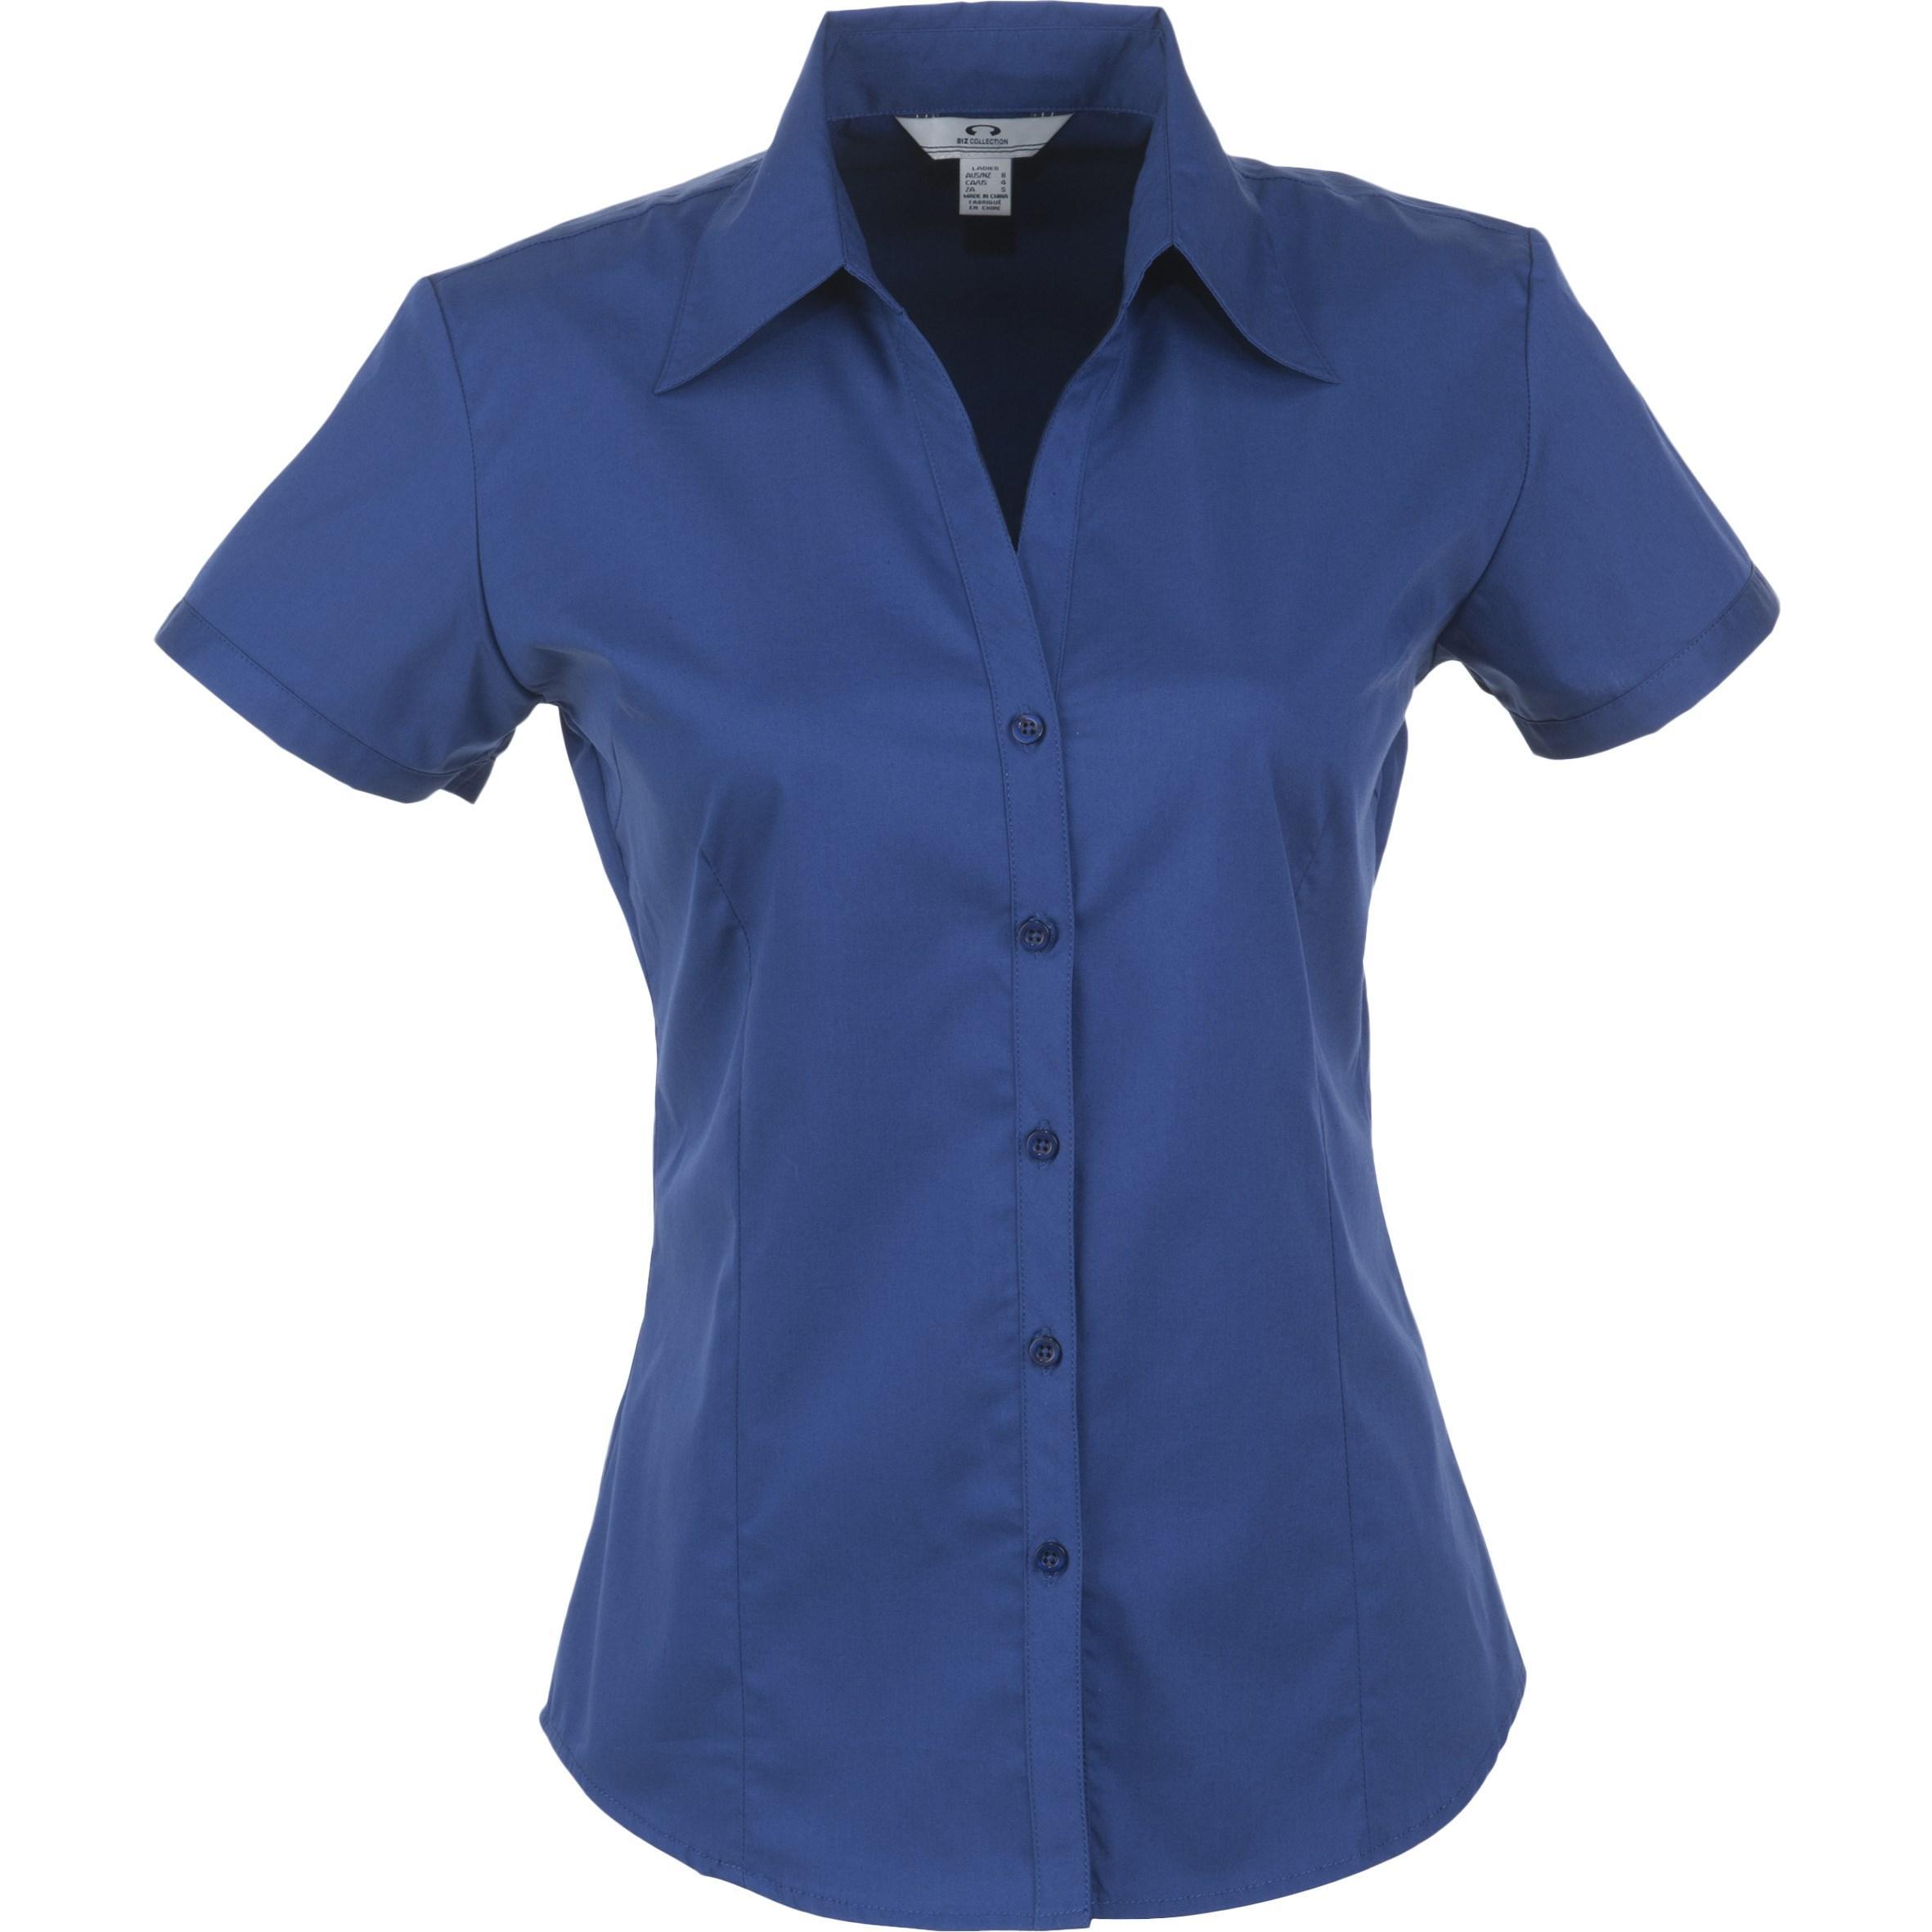 Ladies Short Sleeve Metro Shirt - Royal Blue Only